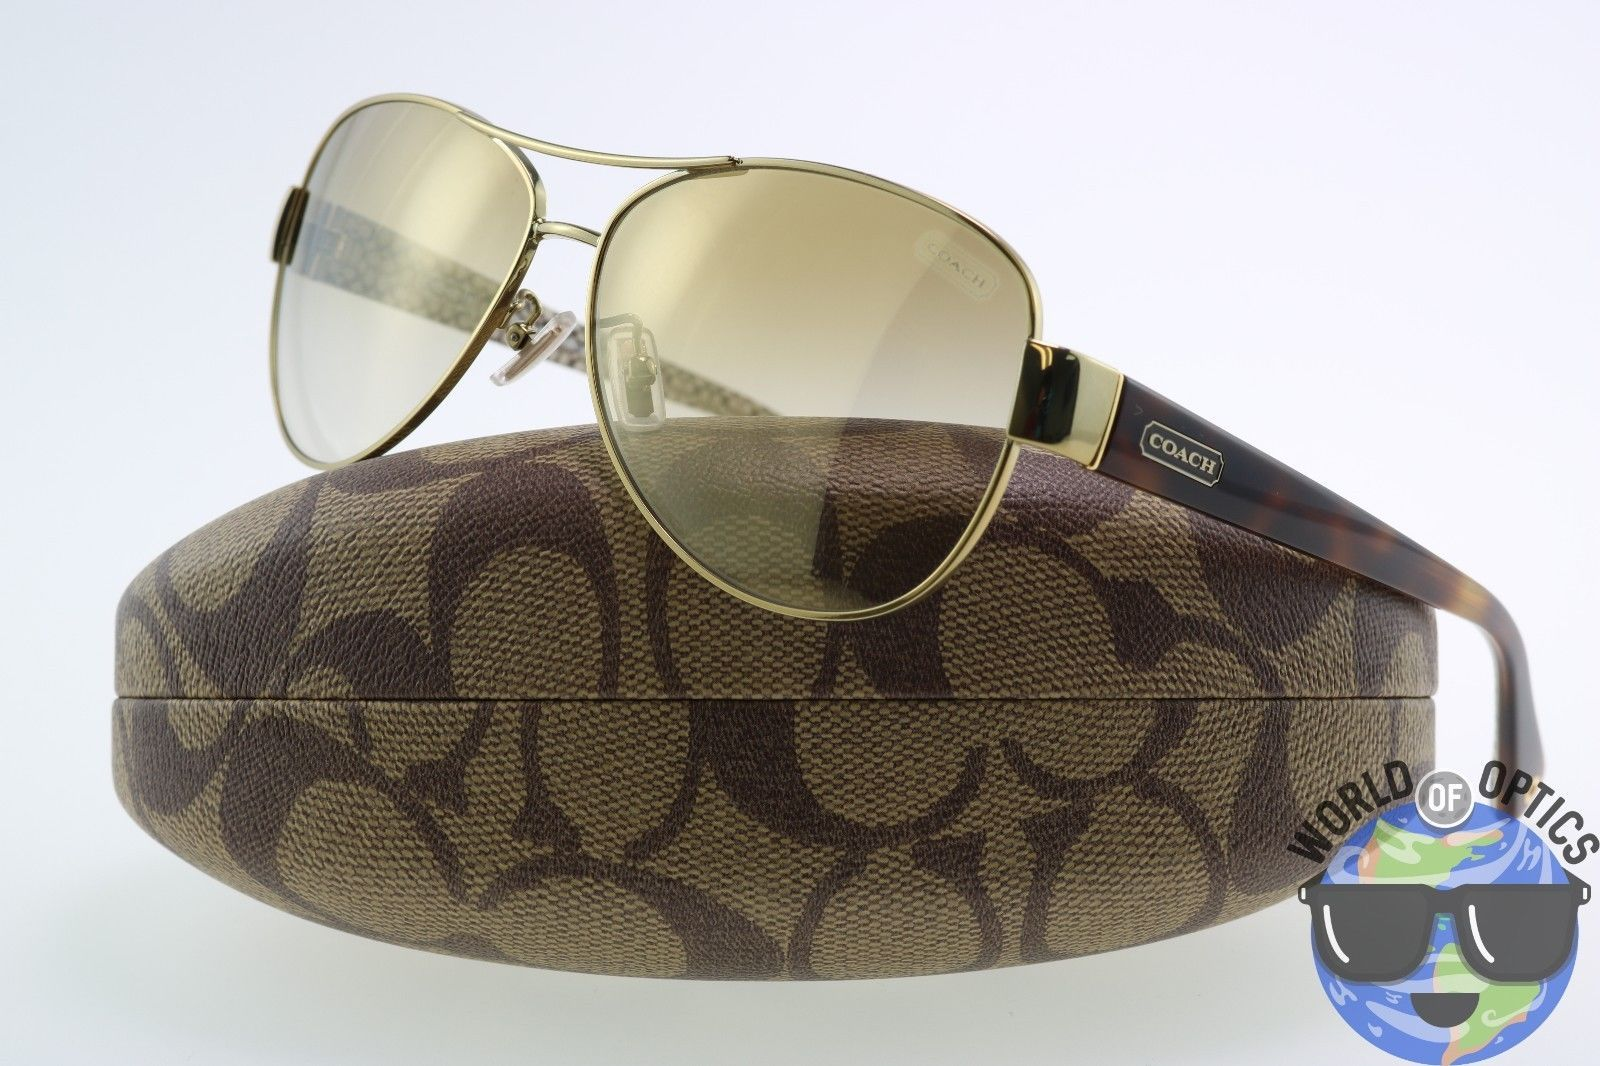 313d631238 ... discount code for coach sunglasses hc7003 91766e l012 kristina gold  tortoise w gold gradient a4dcd 02002